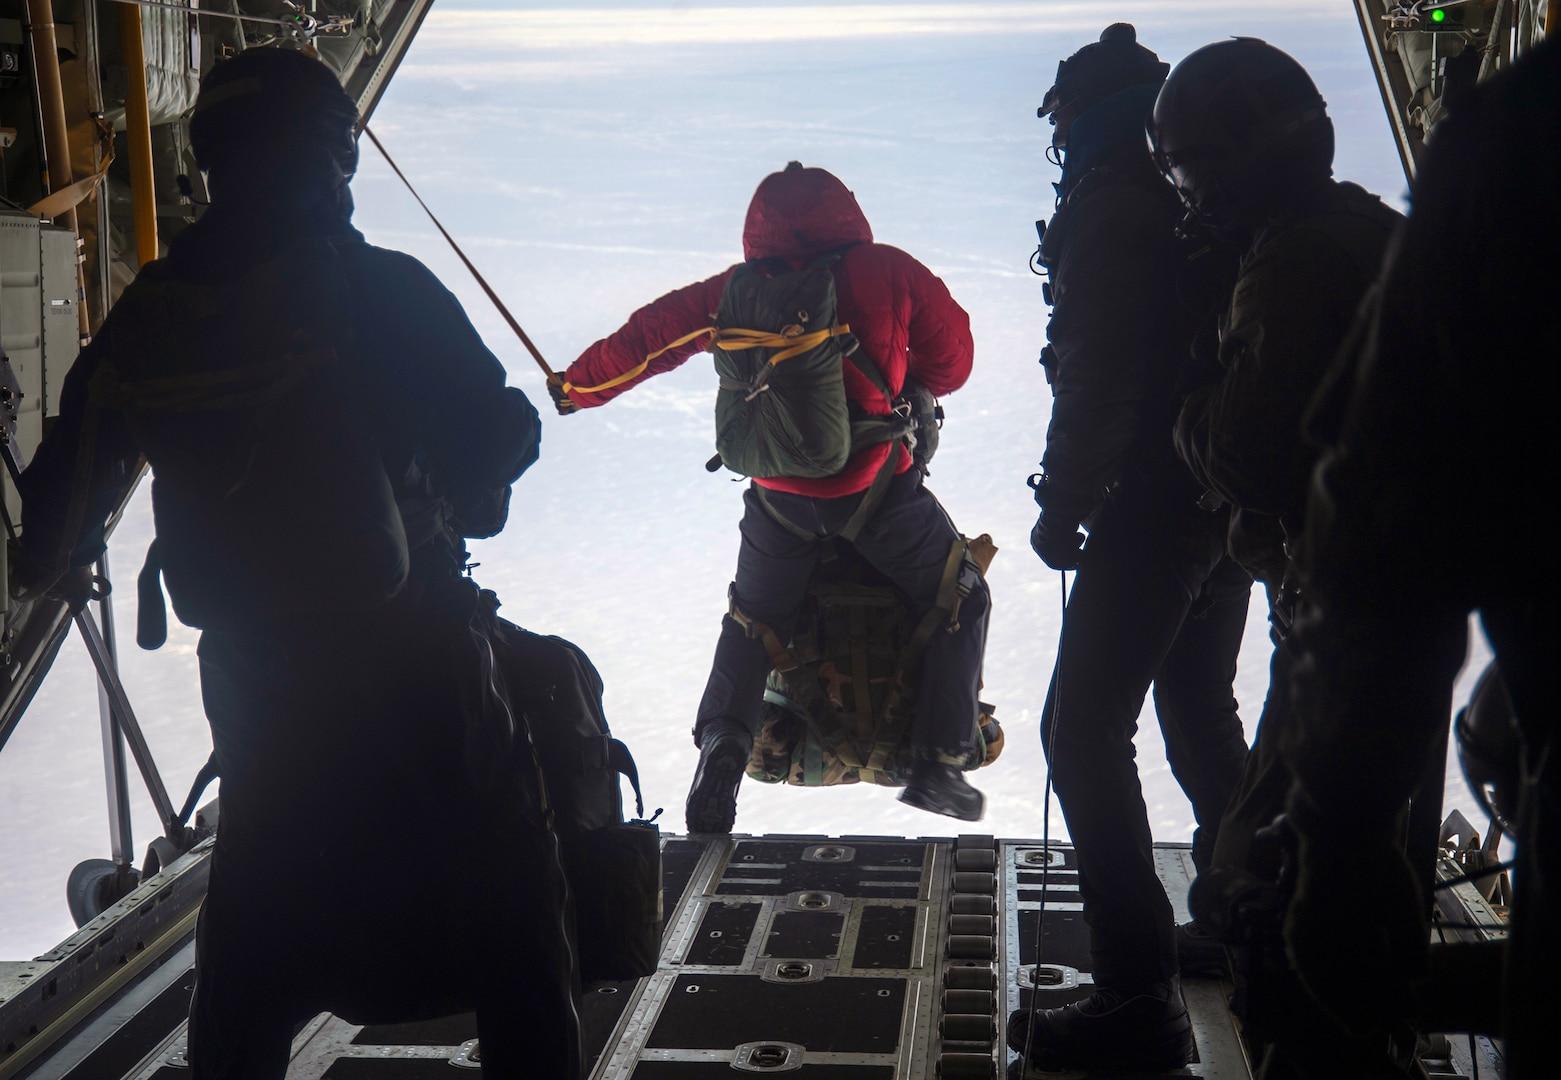 Alaska National Guard's Exercise Arctic Eagle 2020 Wraps Up